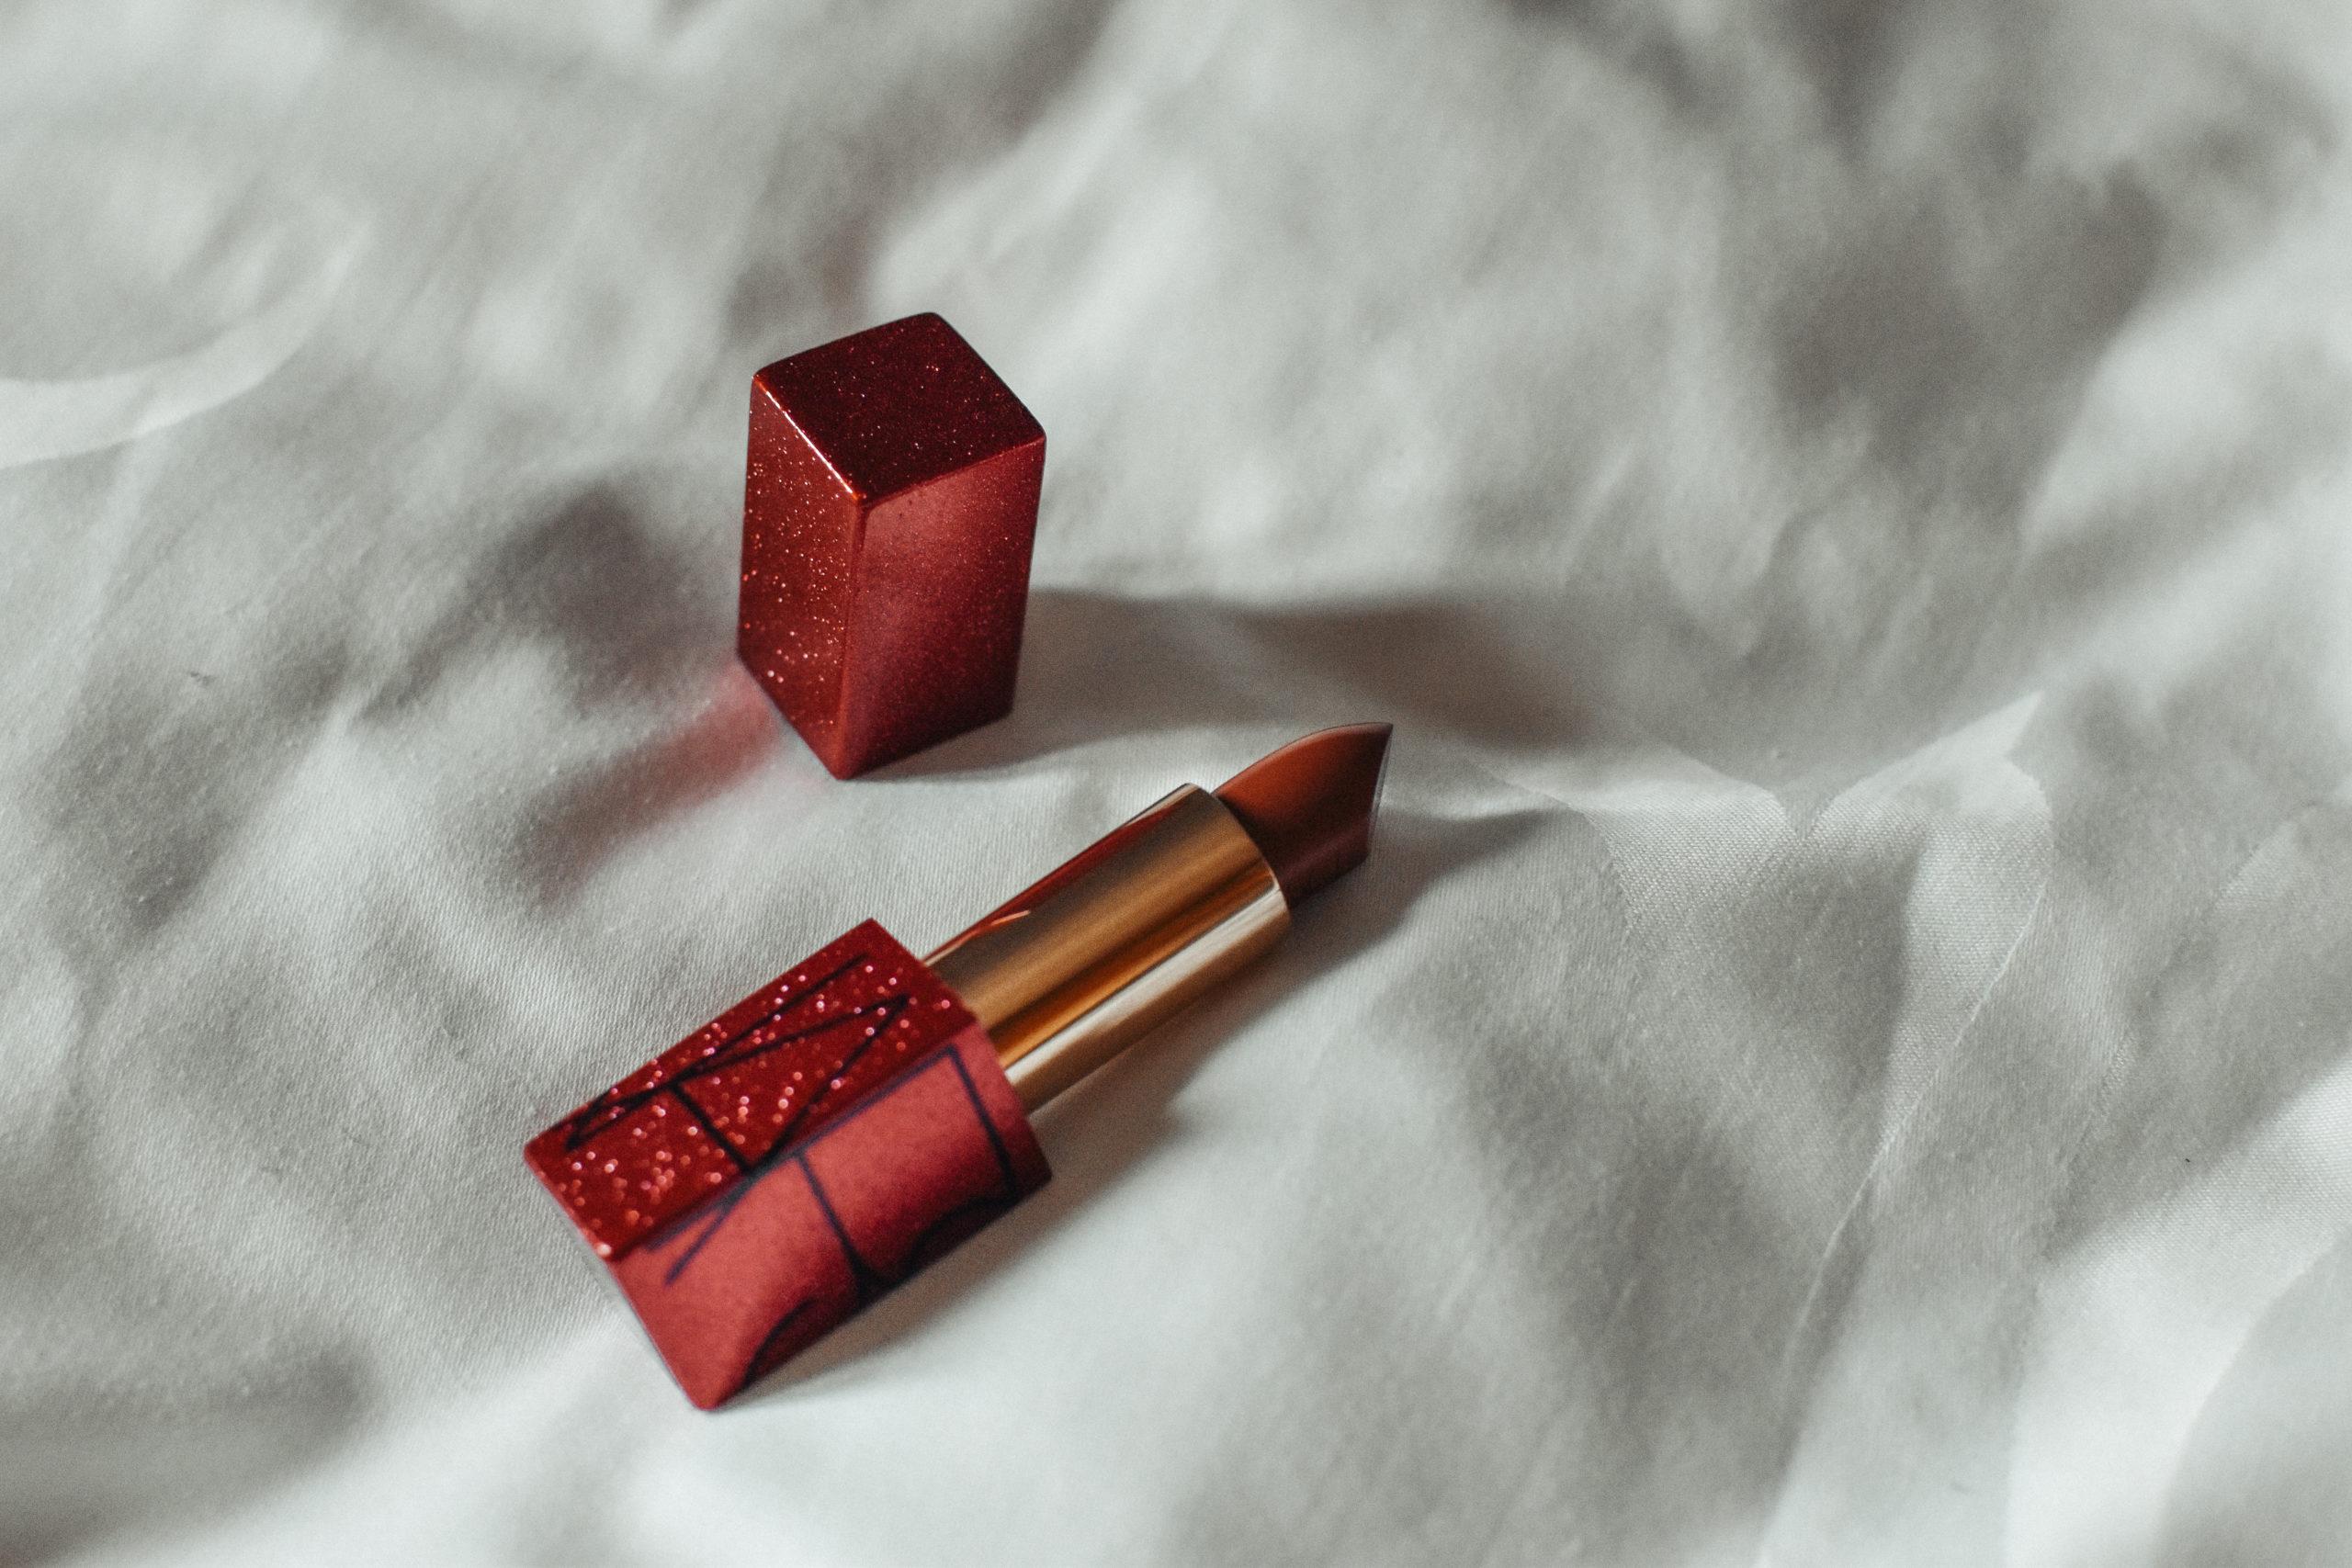 NARS Studio 54 - Audacious Lipstick